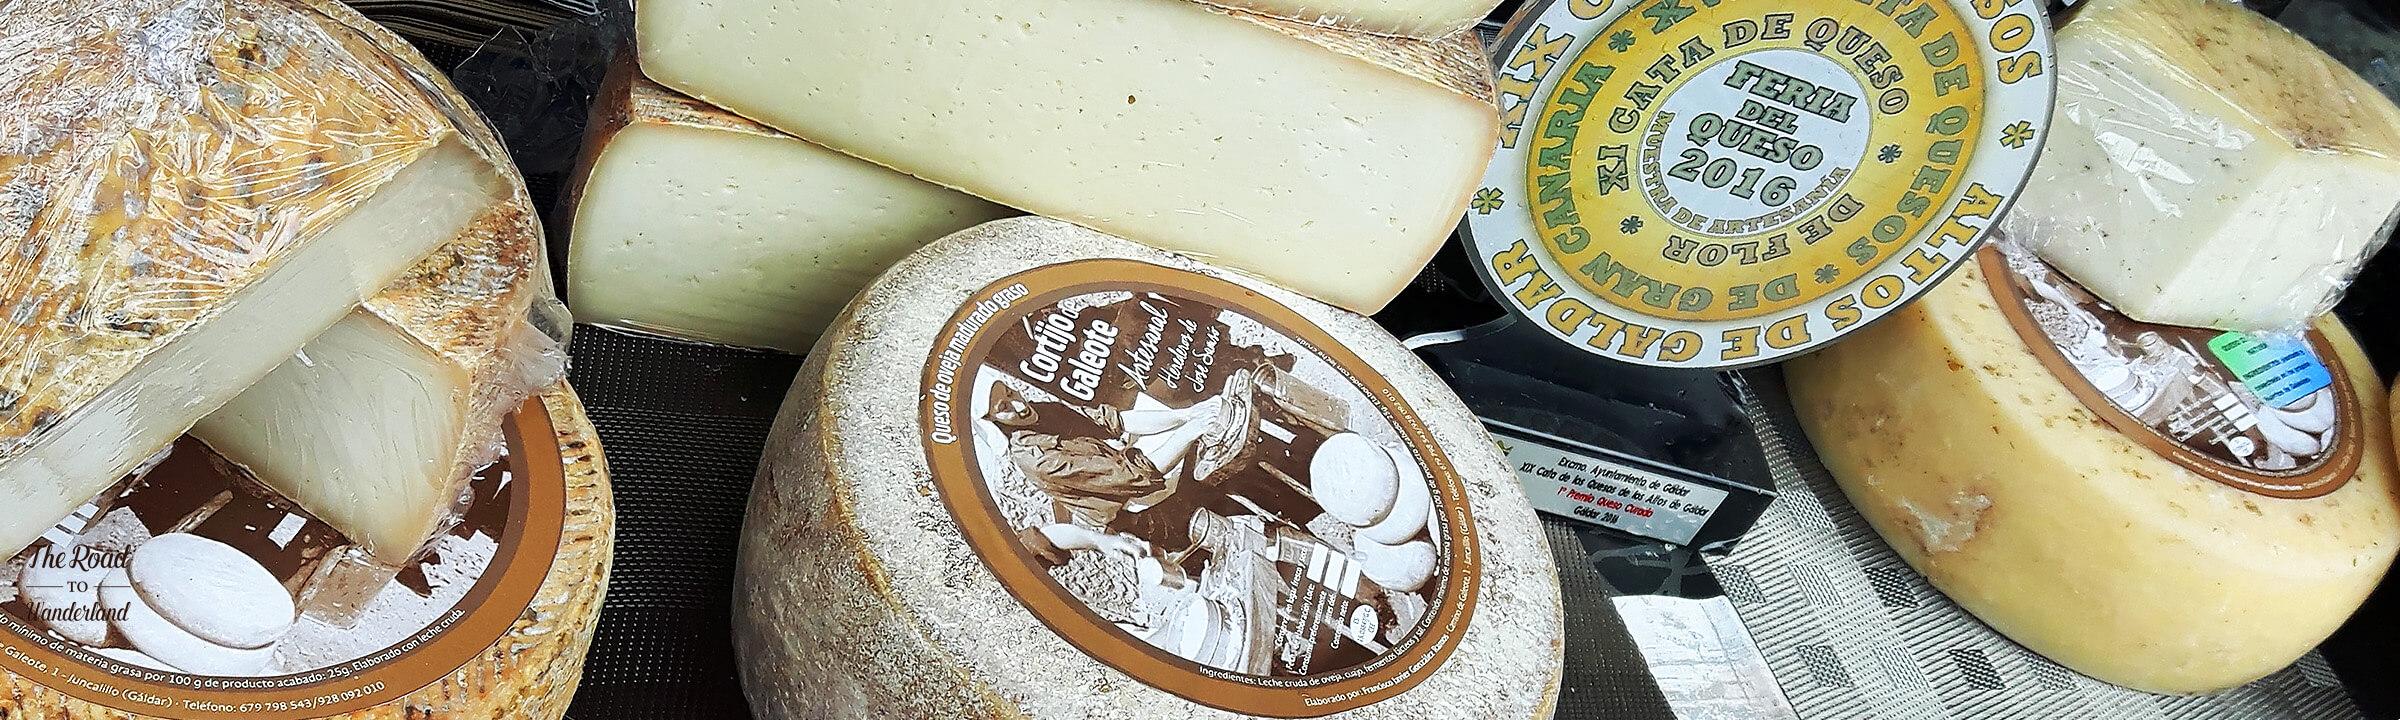 Gran Canaria's Cheese Festival